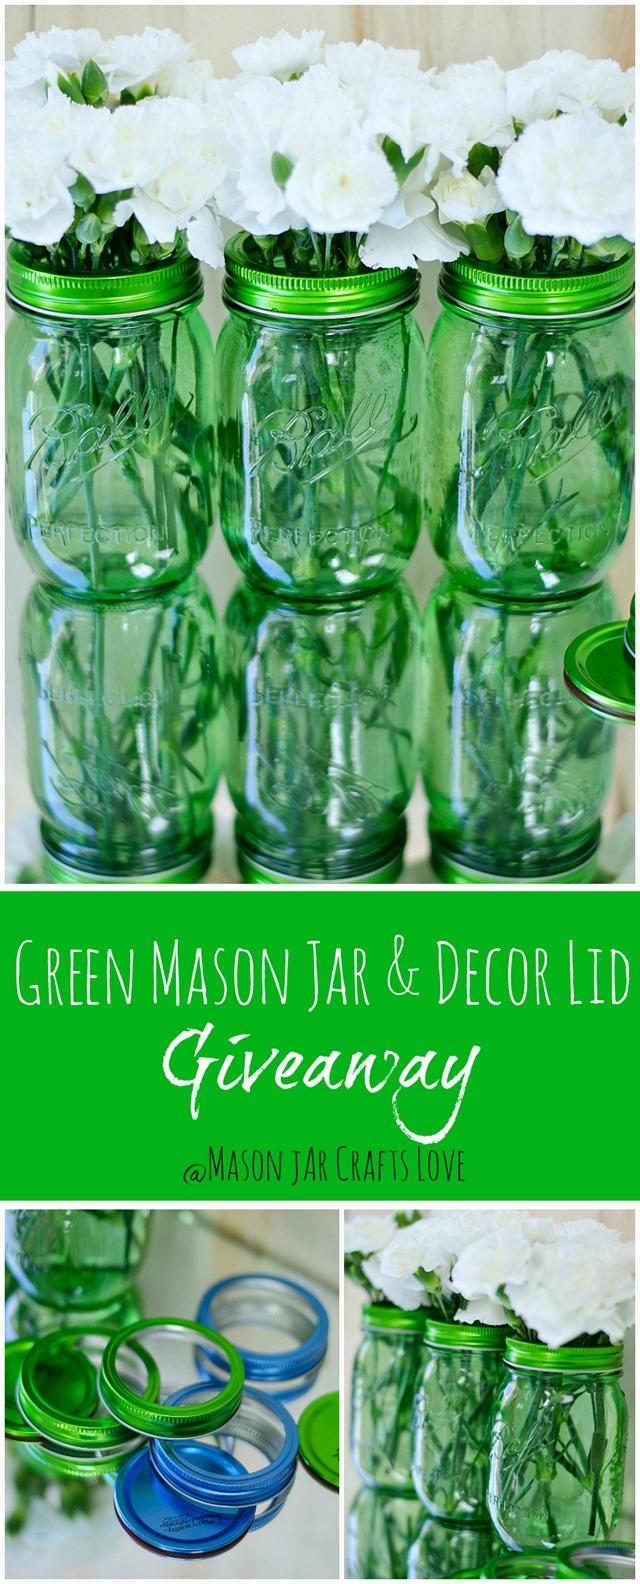 green-mason-jar-giveaway 2